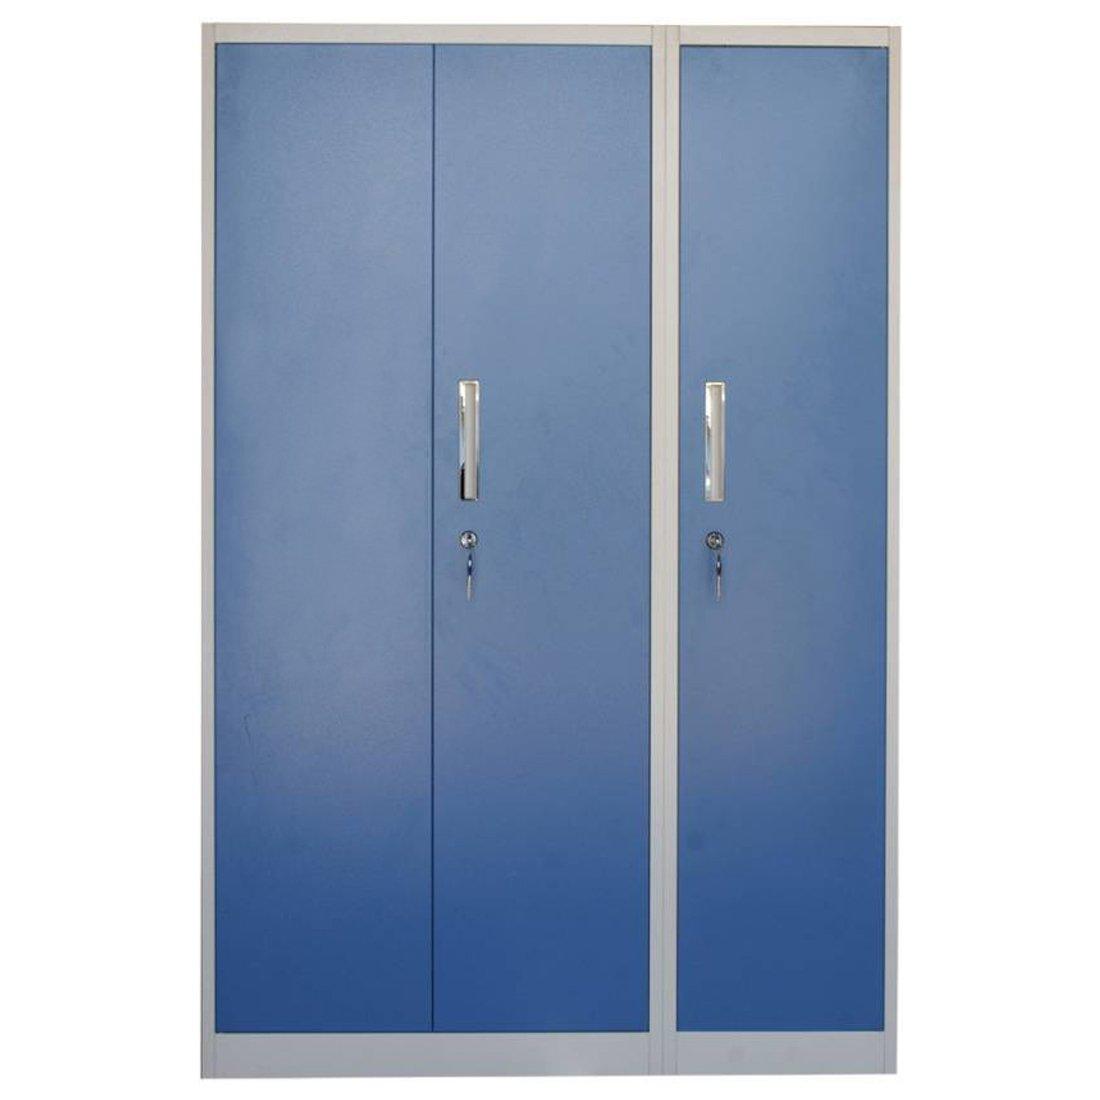 Woodness Tilda 3-Door Metal Almirah (Glossy Finish, Blue)